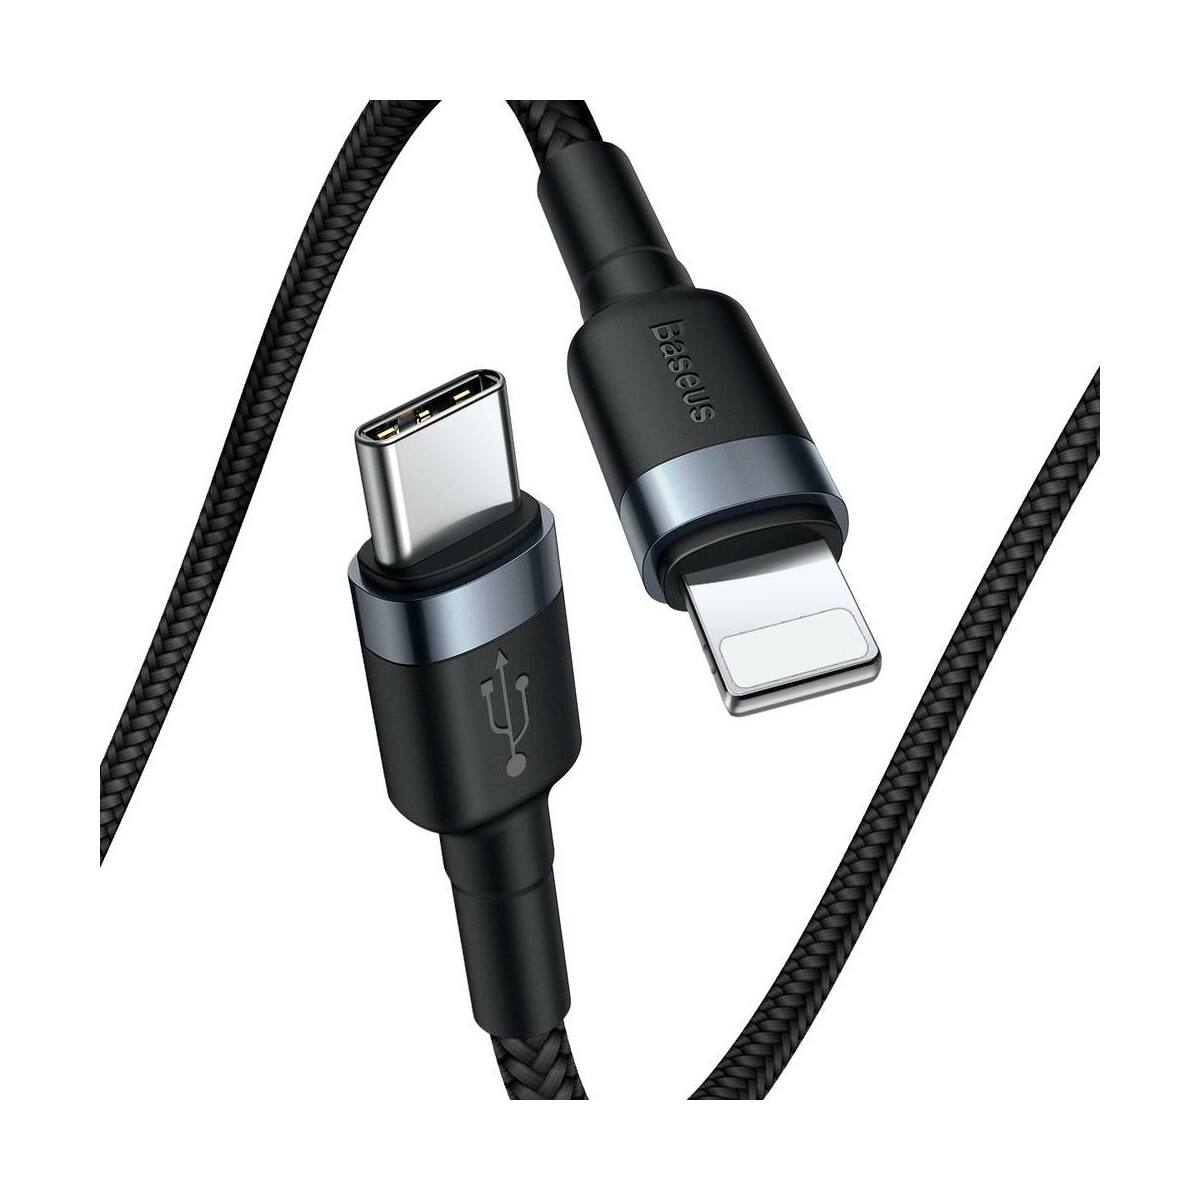 Baseus Type-C - Lightning Cafule kábel, tartós fonott Nylon burkolat, QC3.0, 18W, 1m, fekete/szürke (CATLKLF-G1)